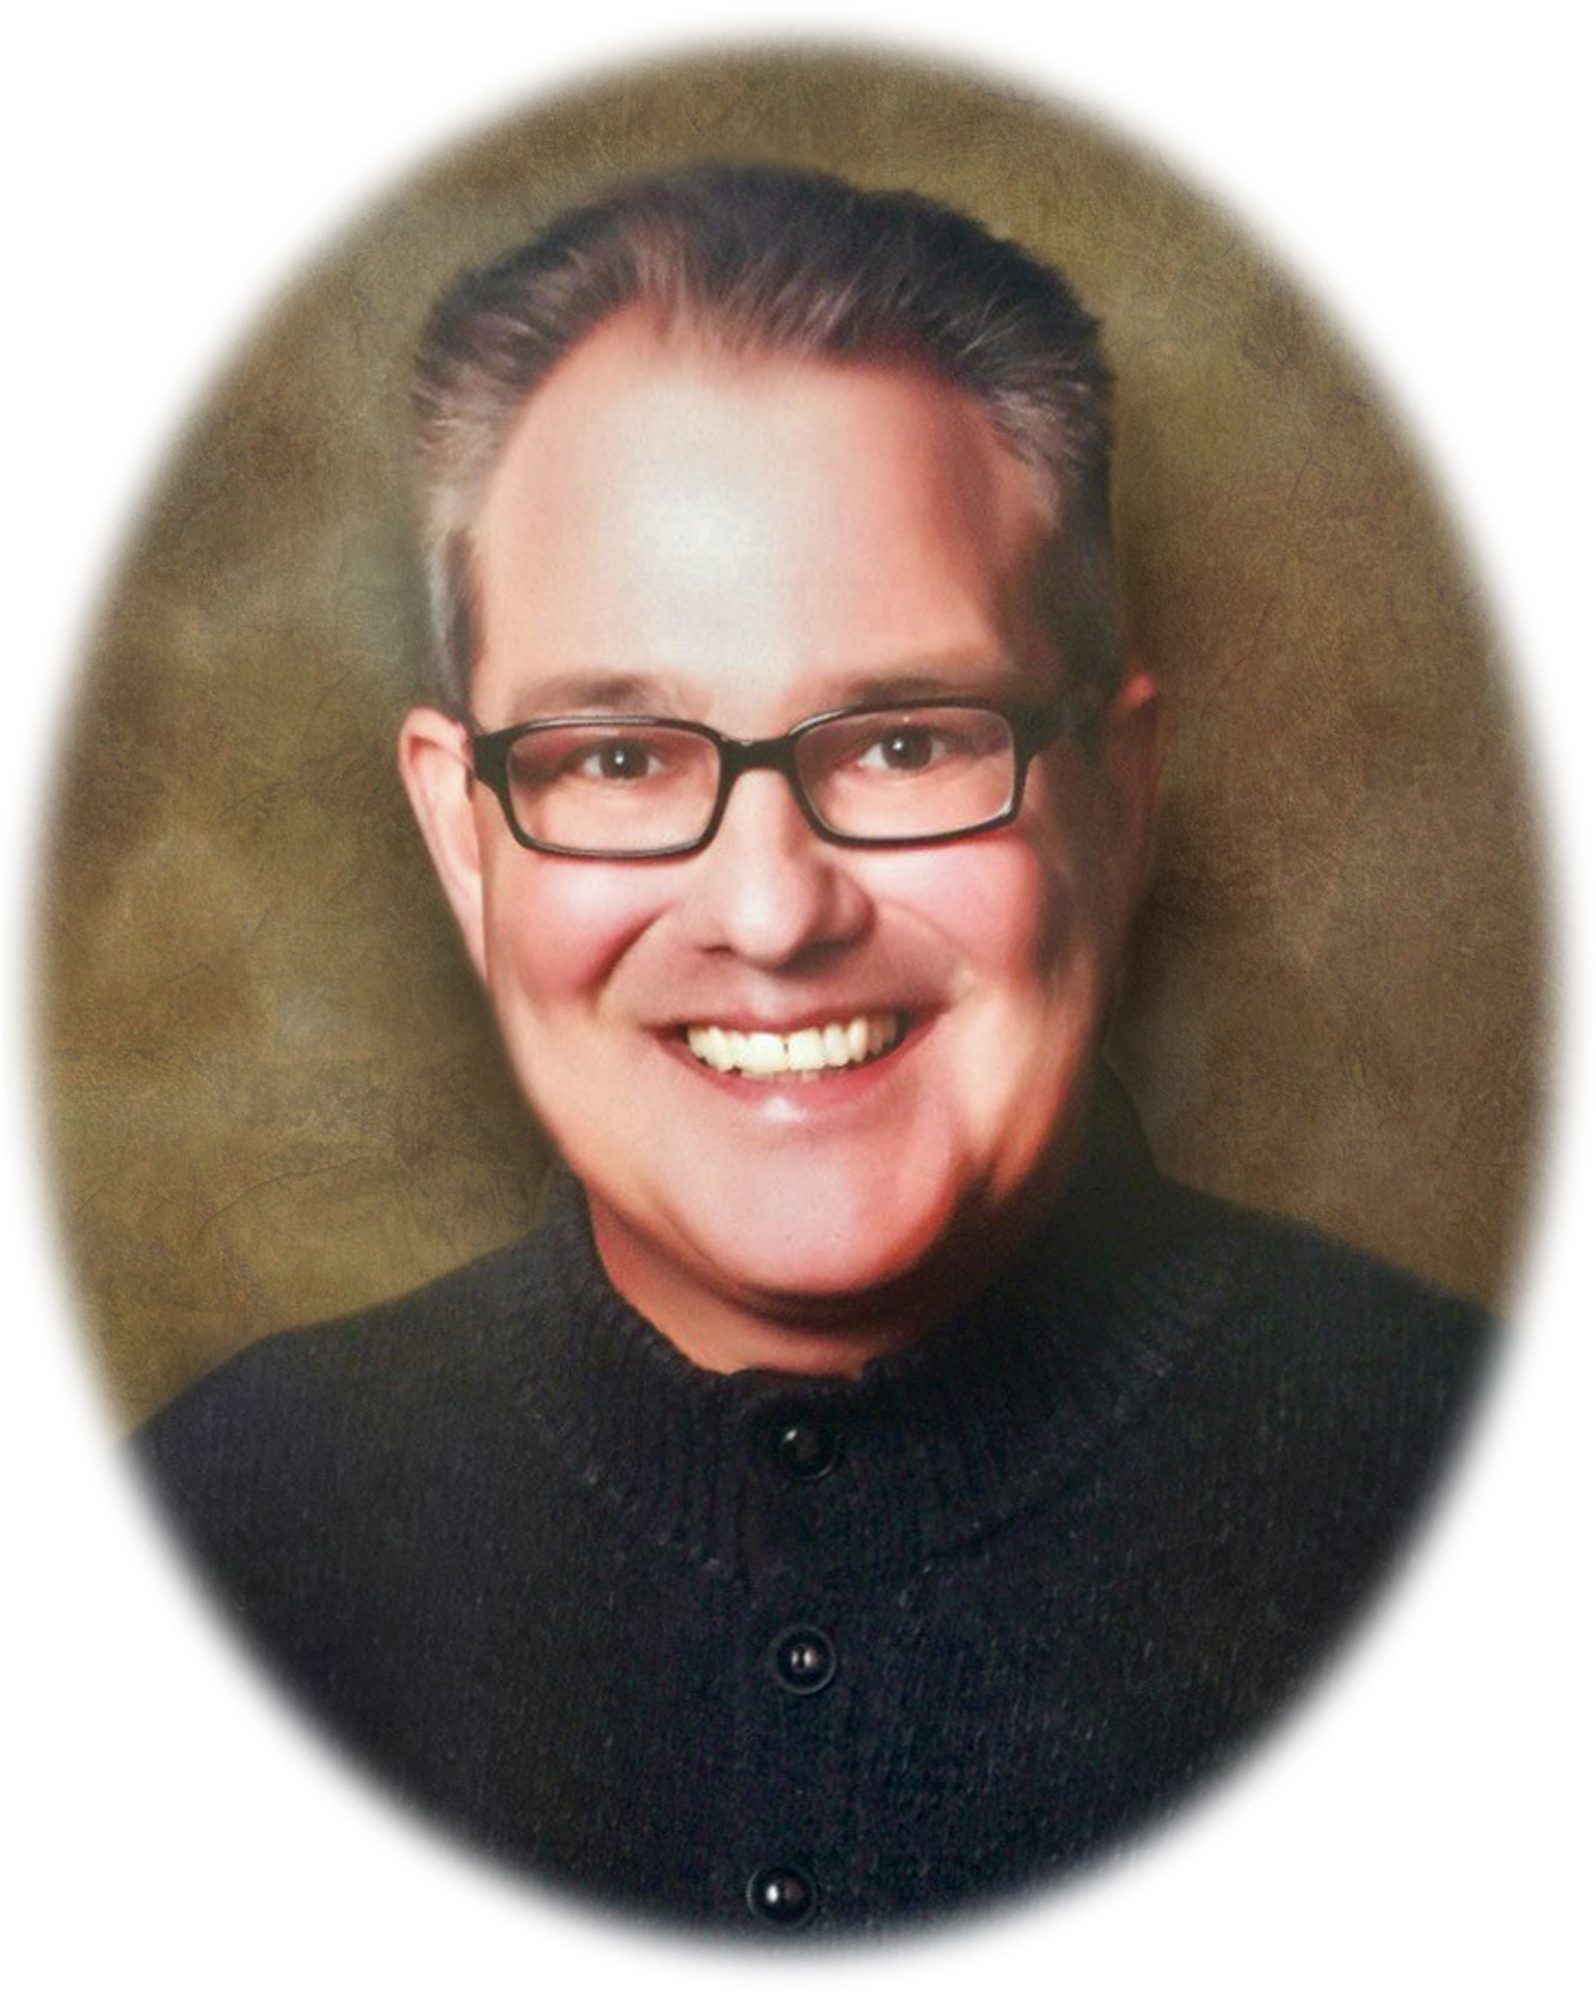 Timothy Scott Booton